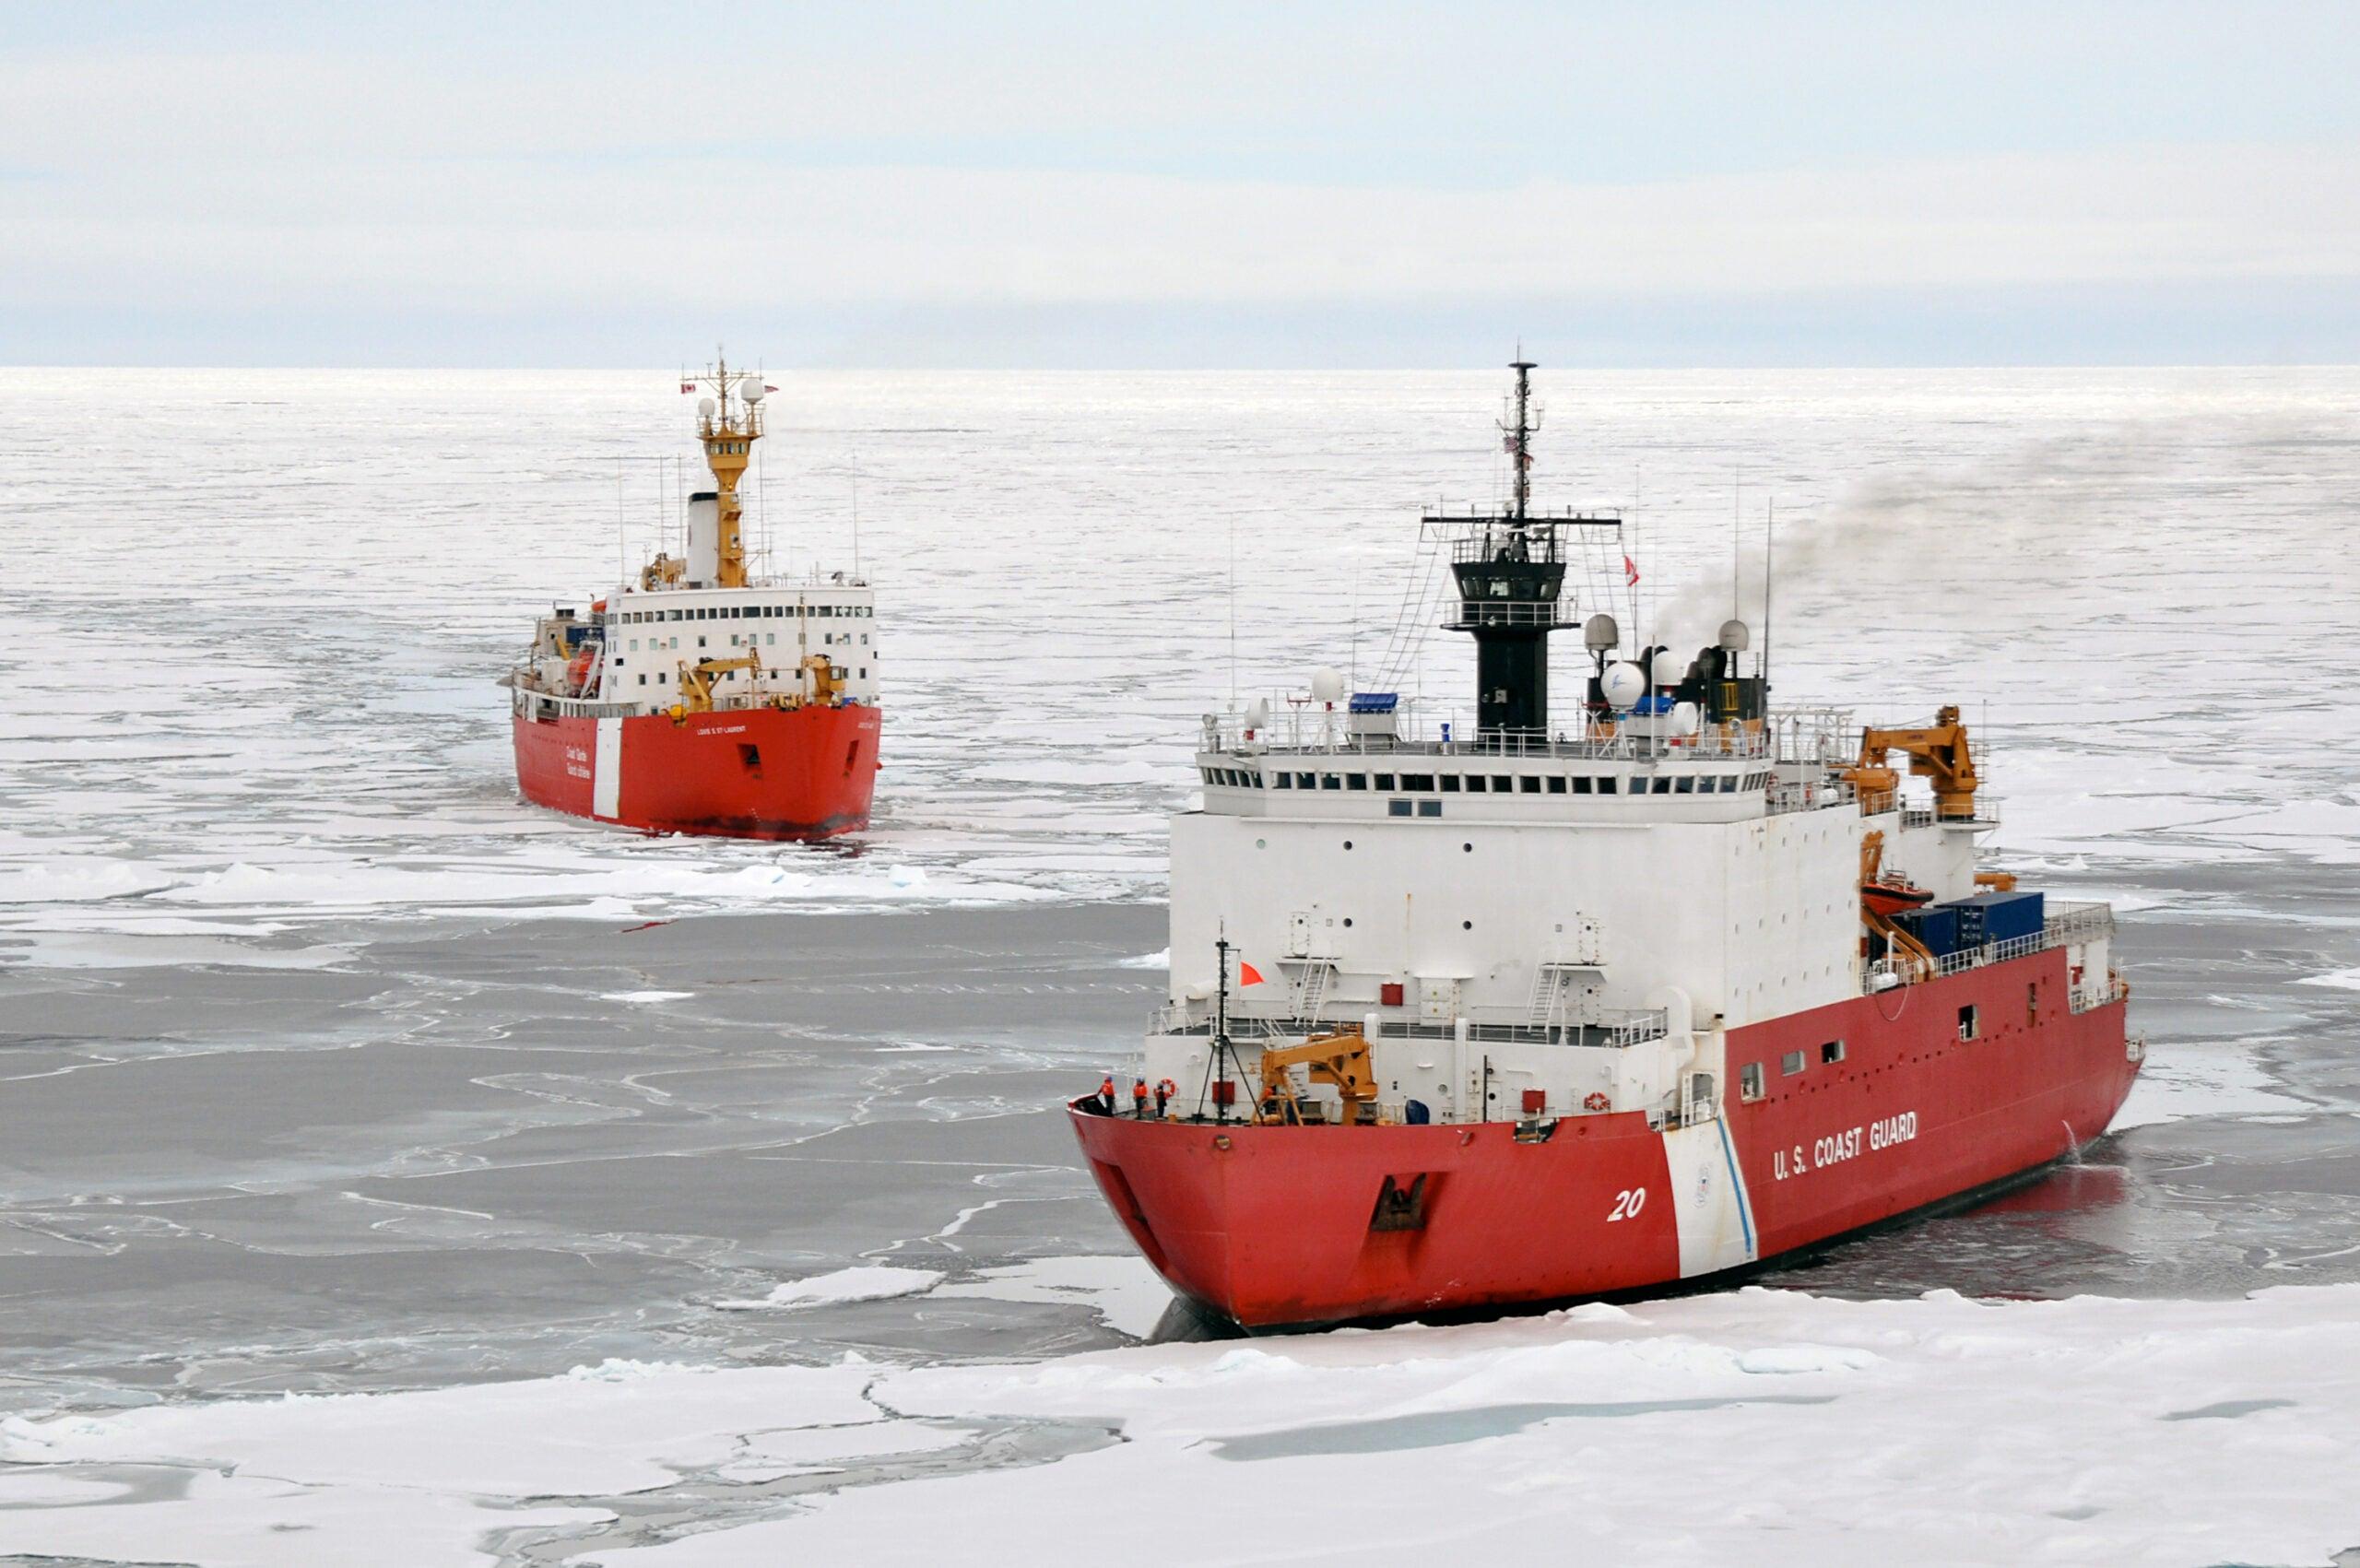 Longest-Ever Fiber-Optic Link Will Run Through Thawing Arctic, Between UK and Japan